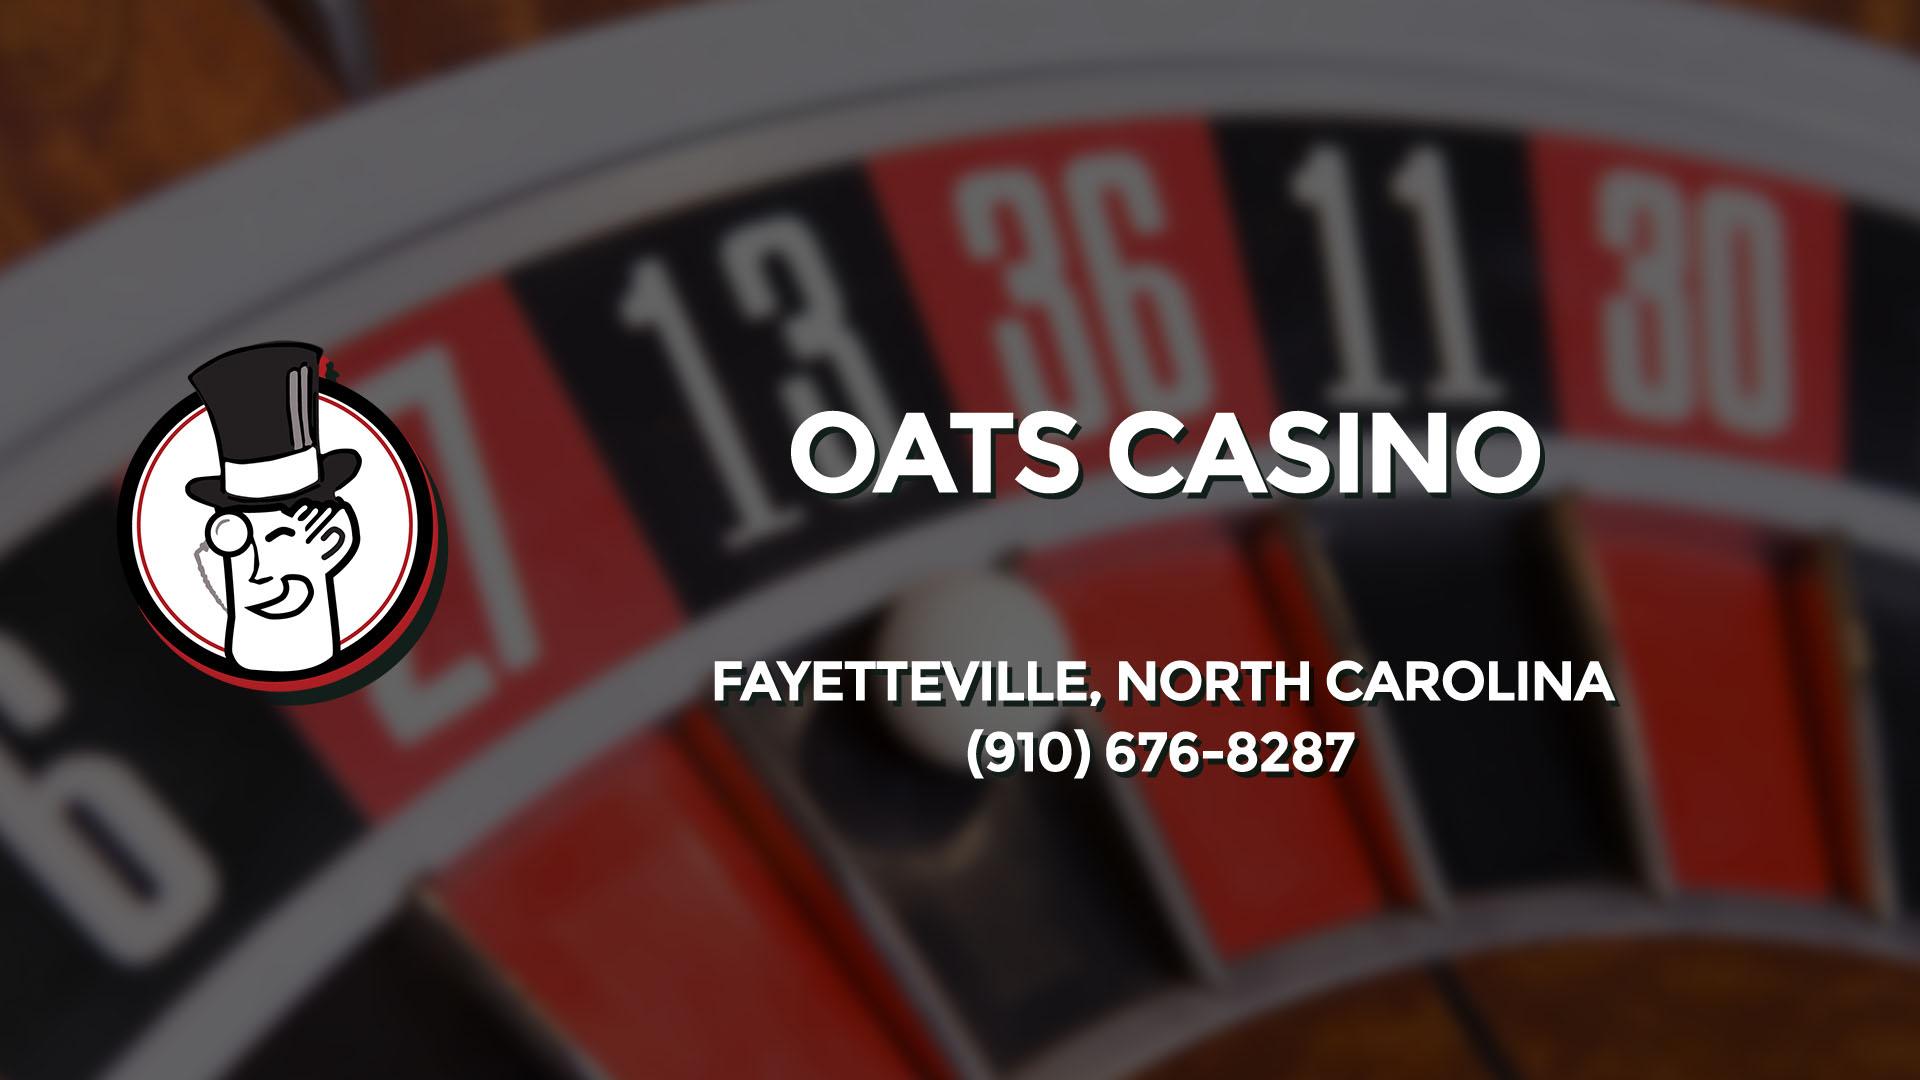 Casino tours from nc online casino gambling license